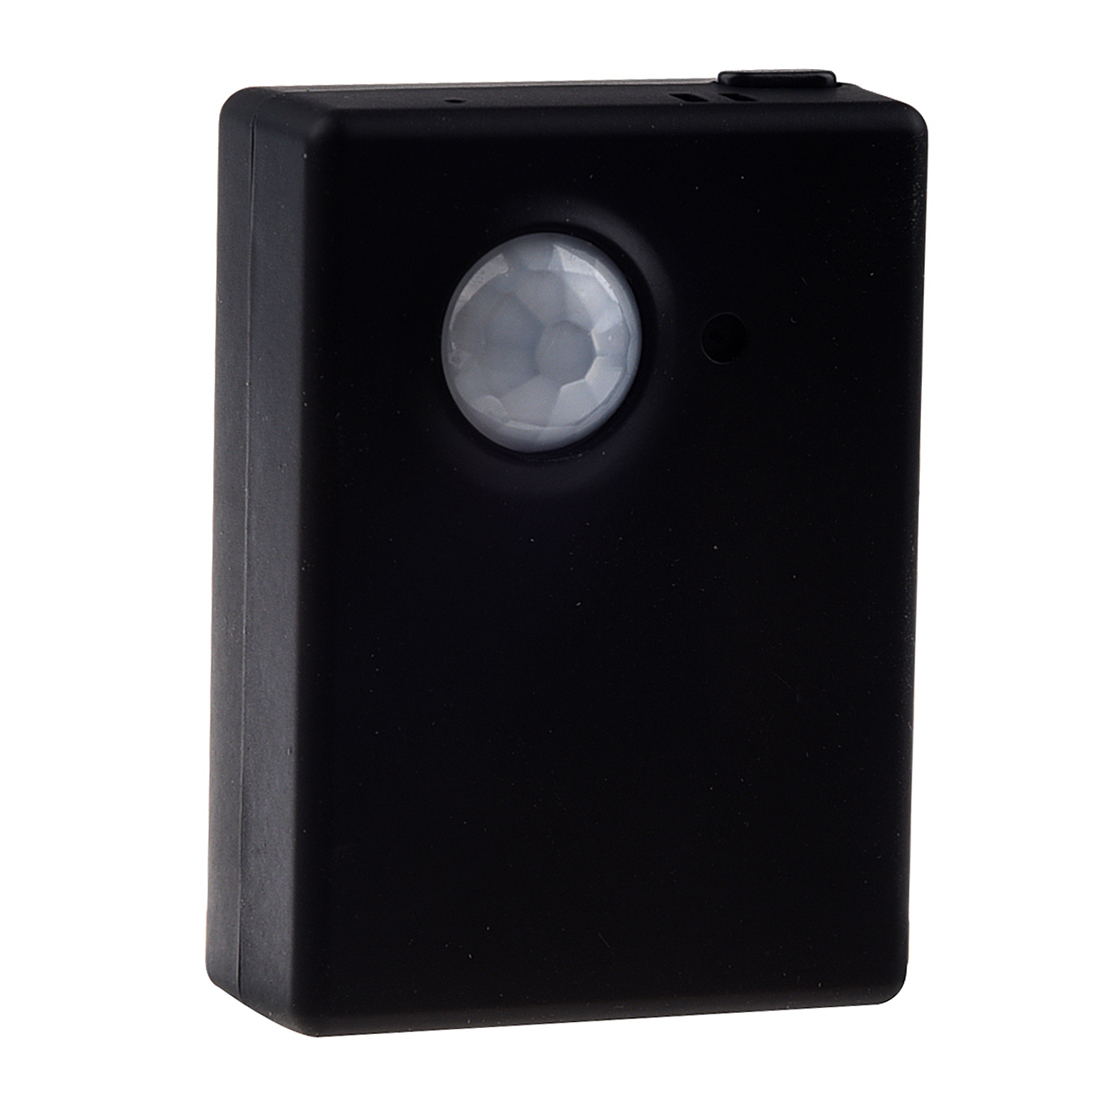 Wireless PIR Infrared Sensor Motion Detector GSM Alarm MMS Monitor Alert mignon pir mini gsm camera alarm system wireless infrared motion detector sensor autoanswer anti theft sms mms gsm alarm system